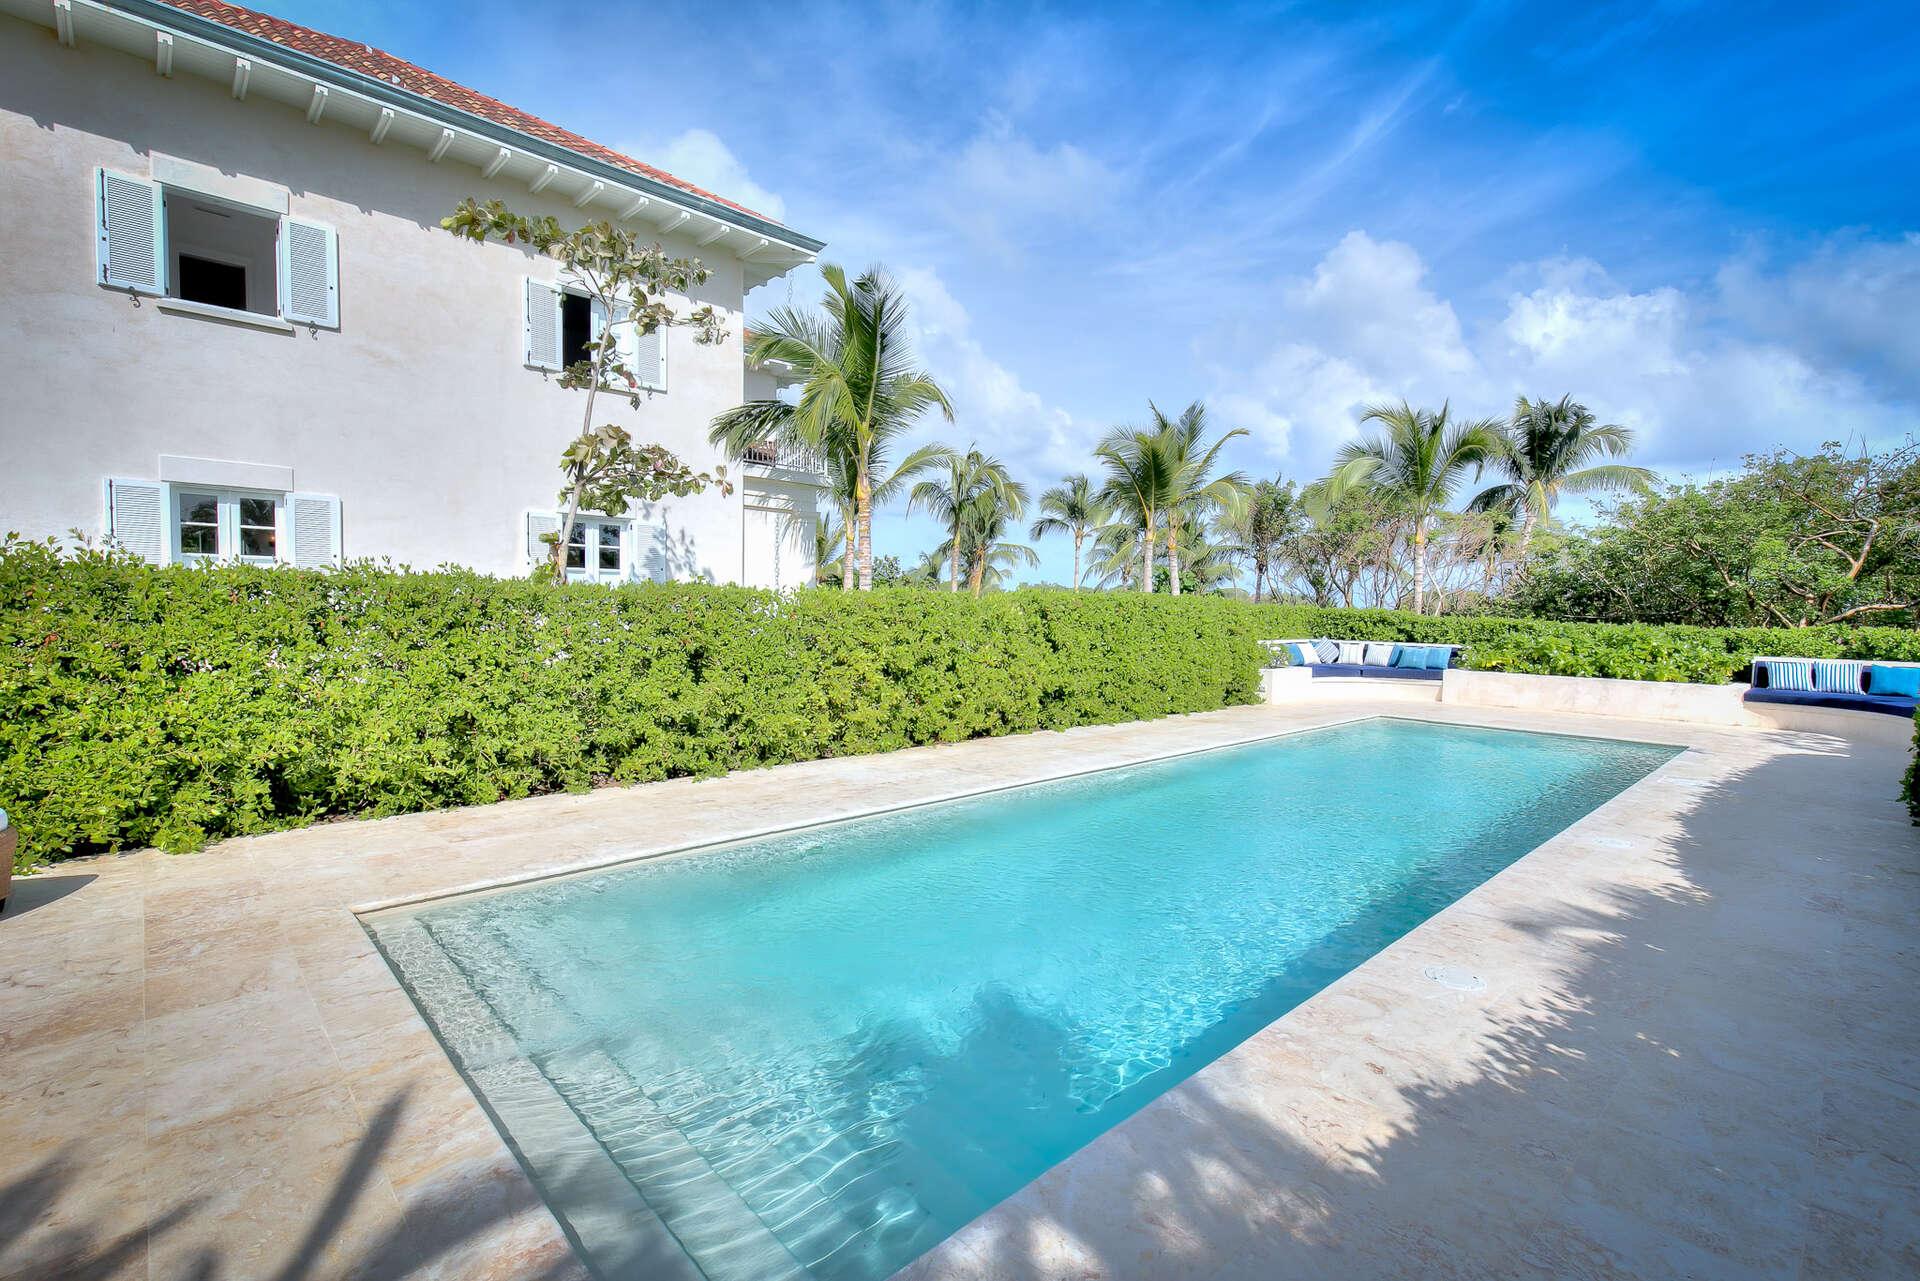 Luxury villa rentals caribbean - Dominican republic - Punta cana - Punta cana resort and club - Corales 50A - Image 1/36